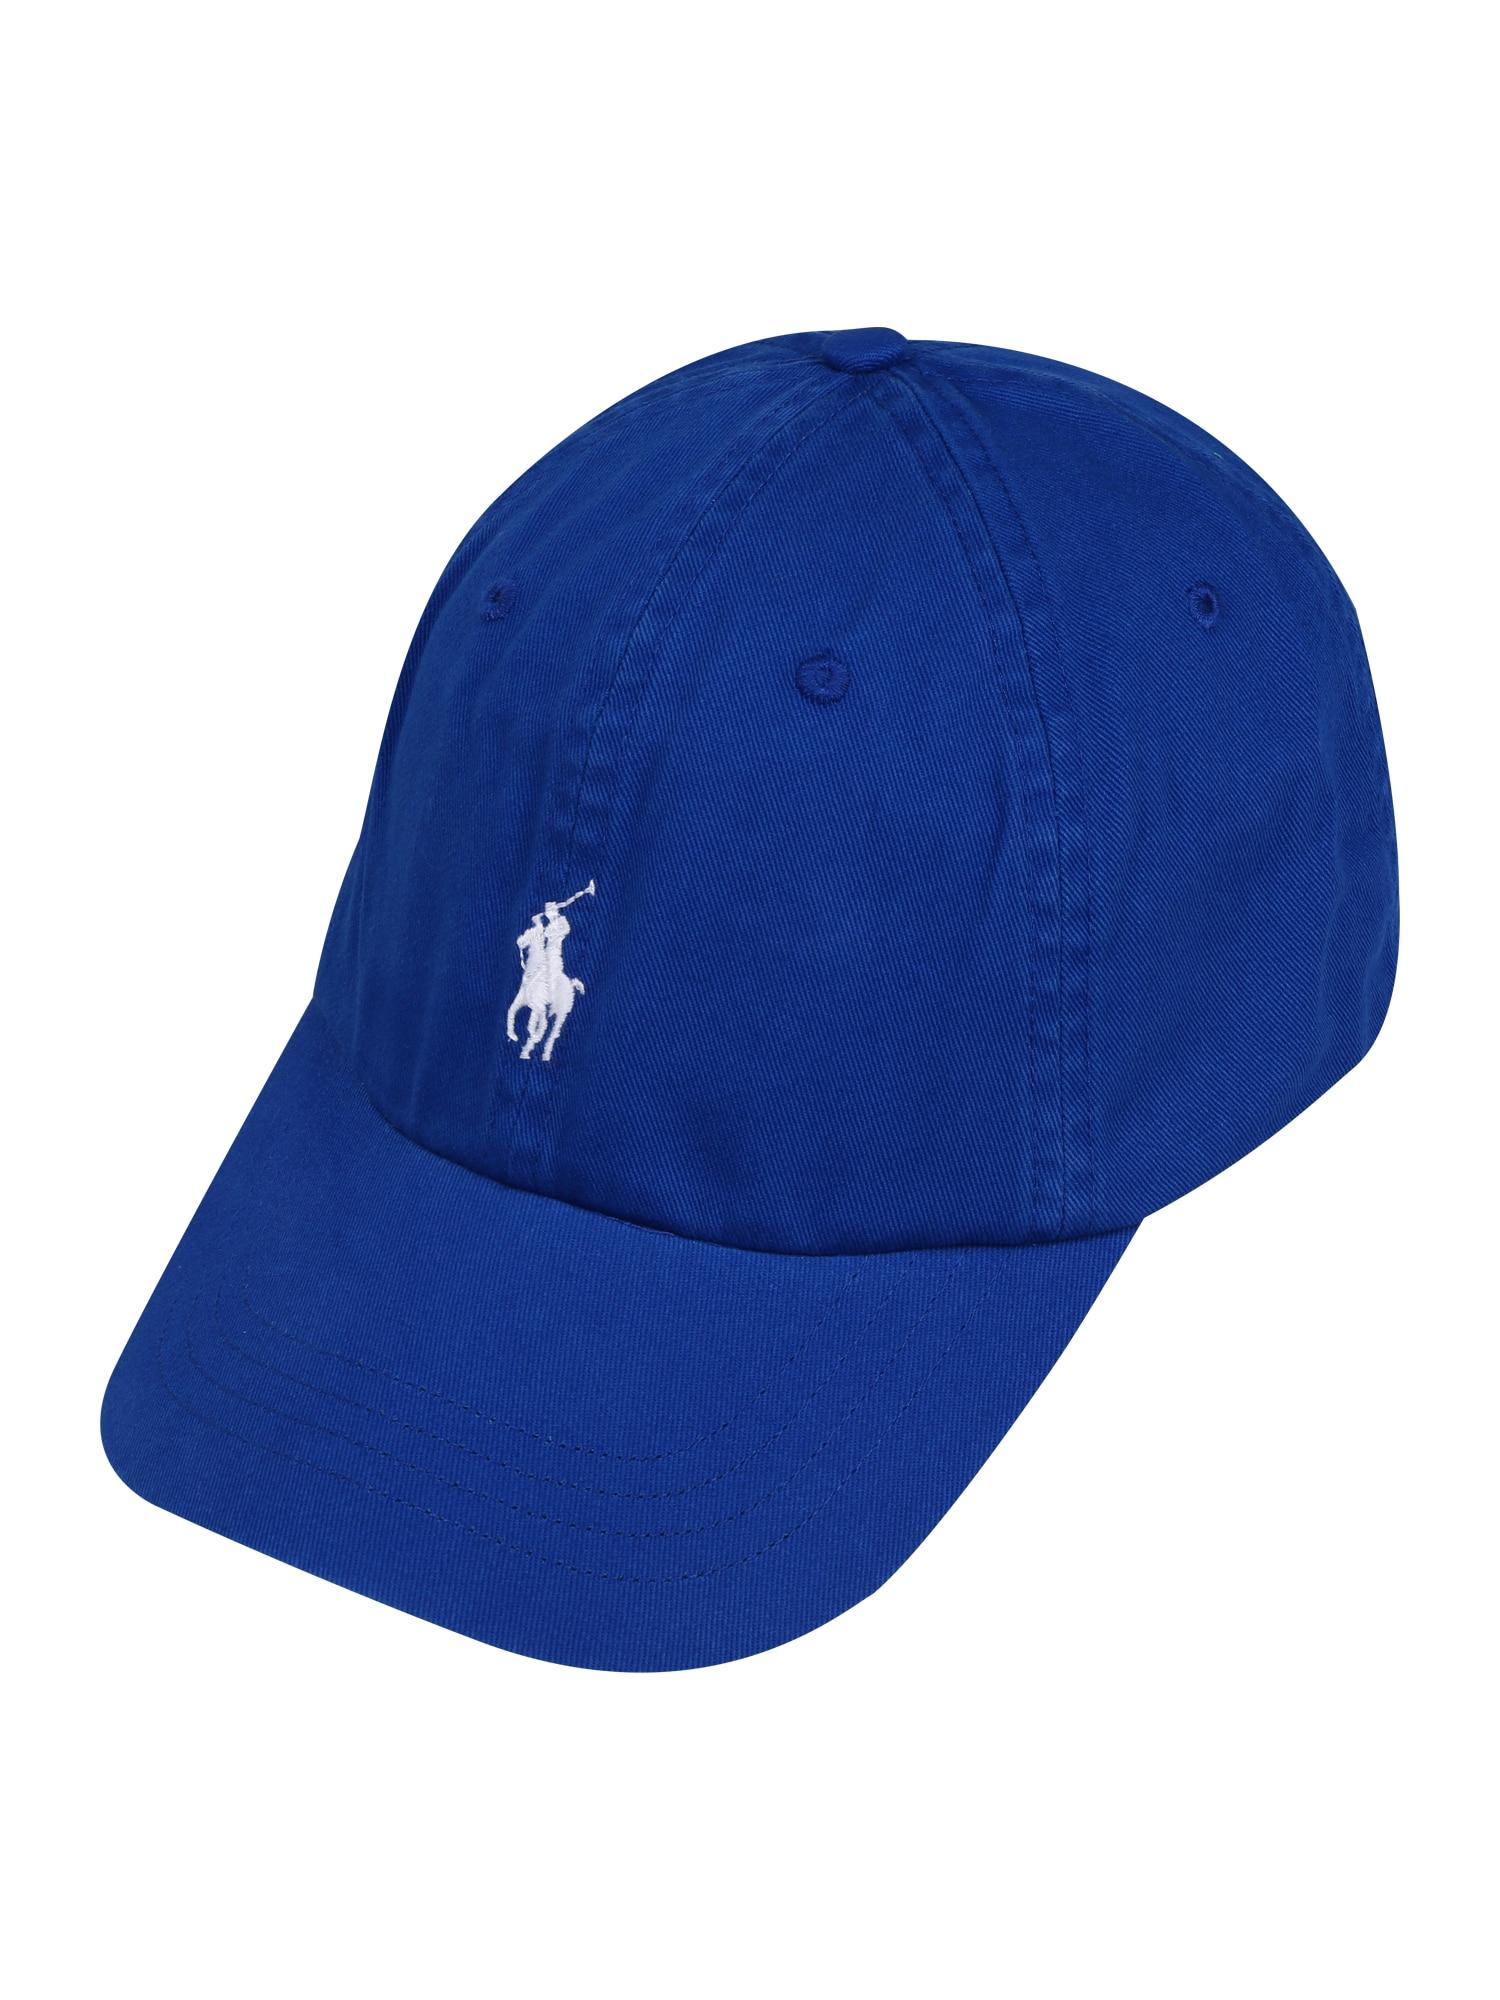 POLO RALPH LAUREN Kepurė 'CLASSIC SPORT CAP W/ SMALL PP' tamsiai mėlyna / šviesiai mėlyna